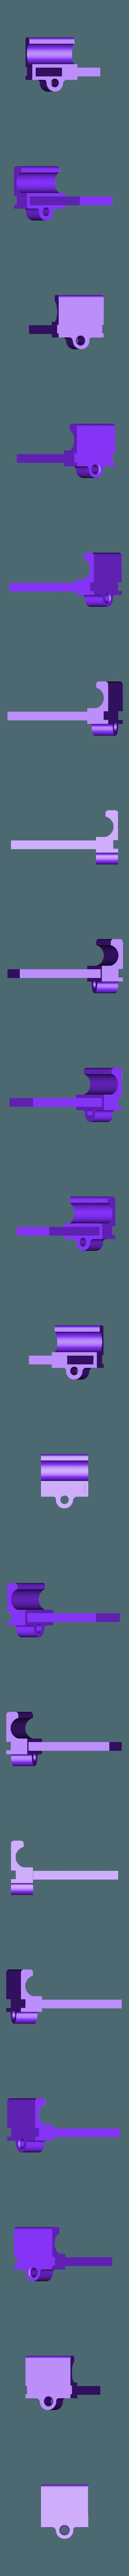 V2_phon_grip_top.stl Download free STL file tripod / GoPro phone mount • 3D printer model, MakeItWork